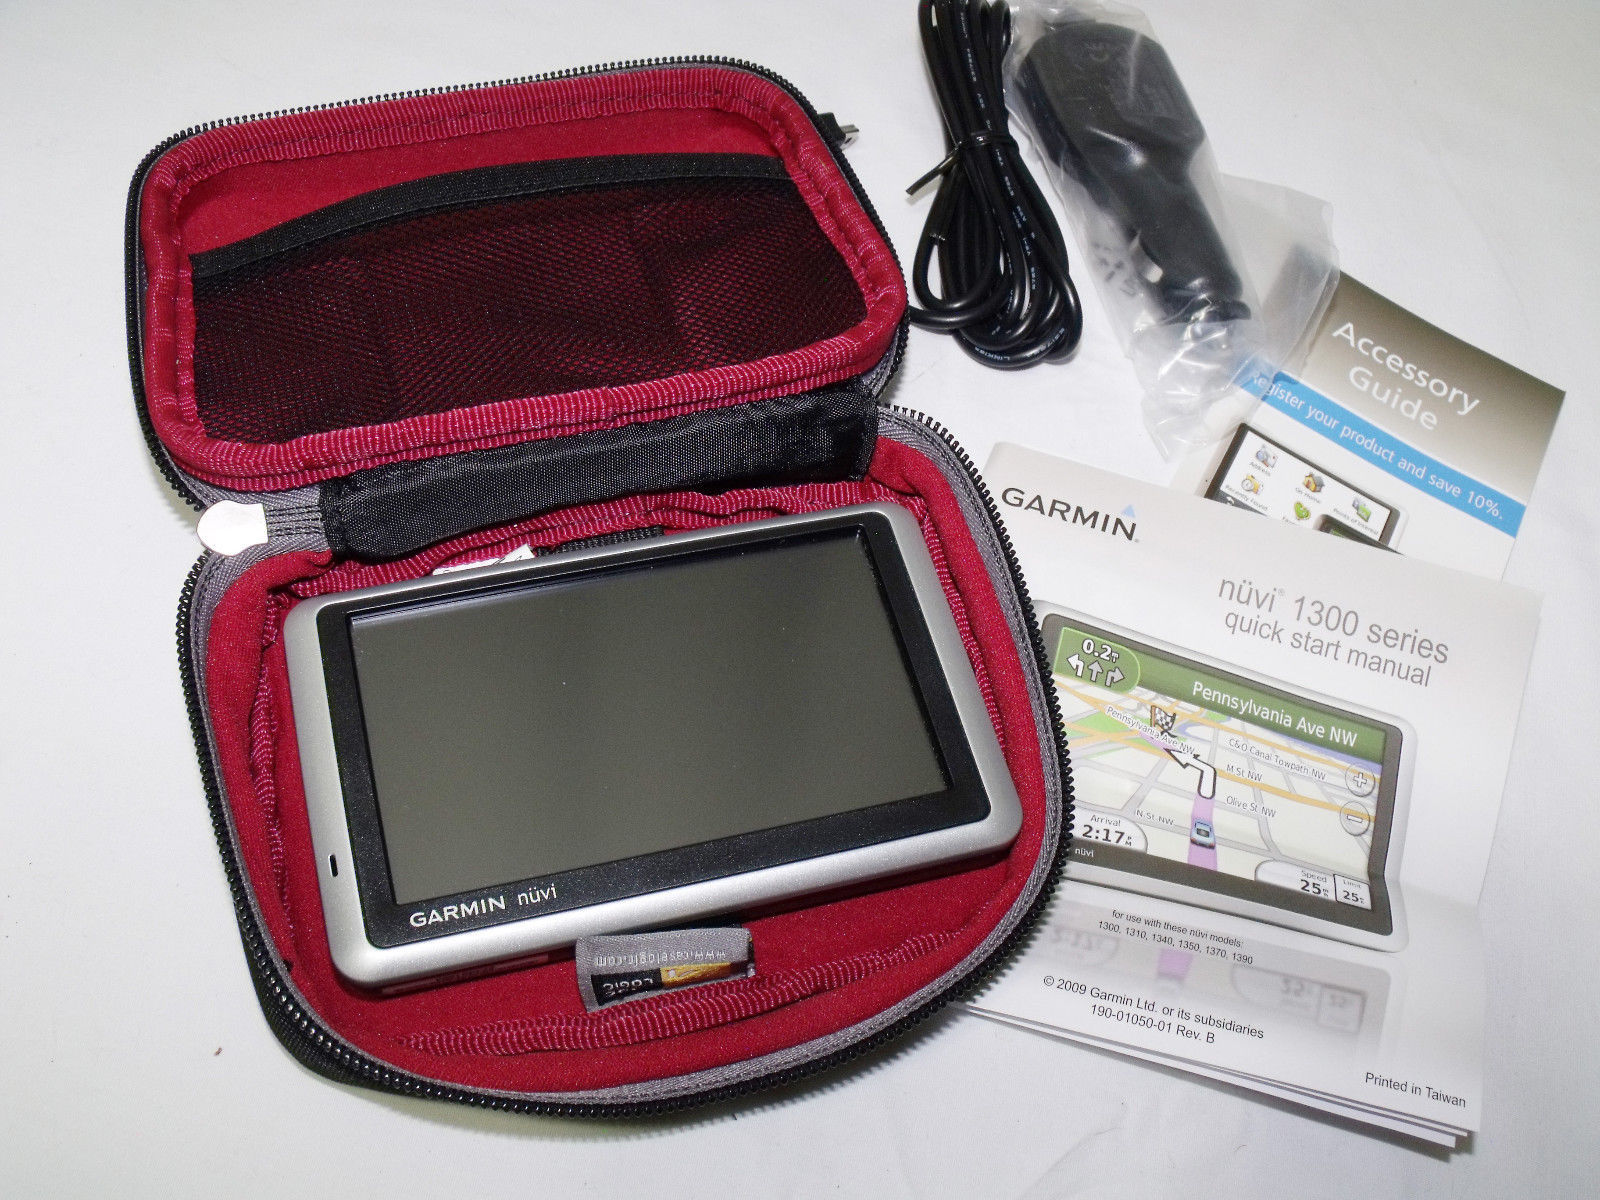 Garmin Nuvi 1300 GPS Charging Cable Storage and 50 similar items